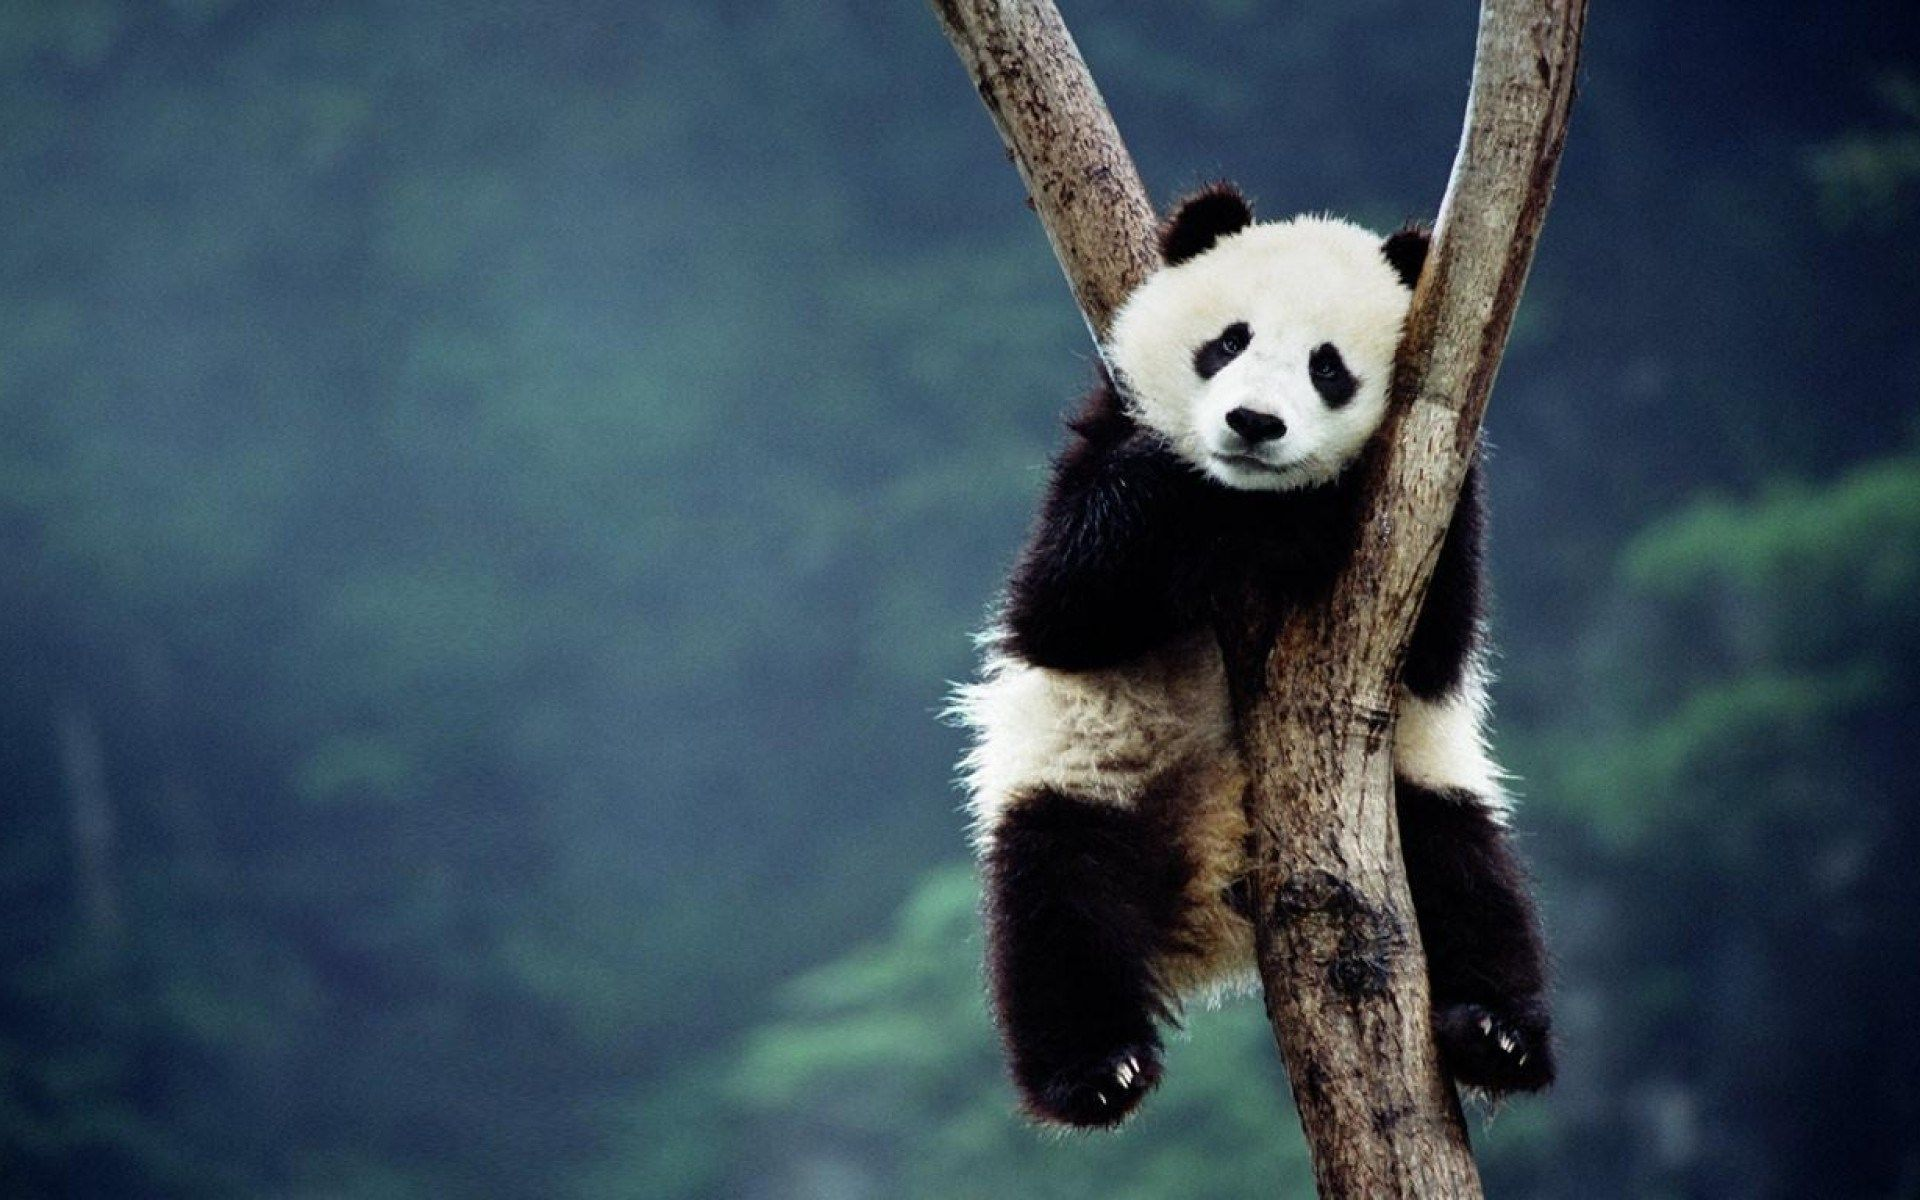 Panda Desktop Wallpaper Baby Panda Bears Sleeping Animals Panda Bears Wallpaper